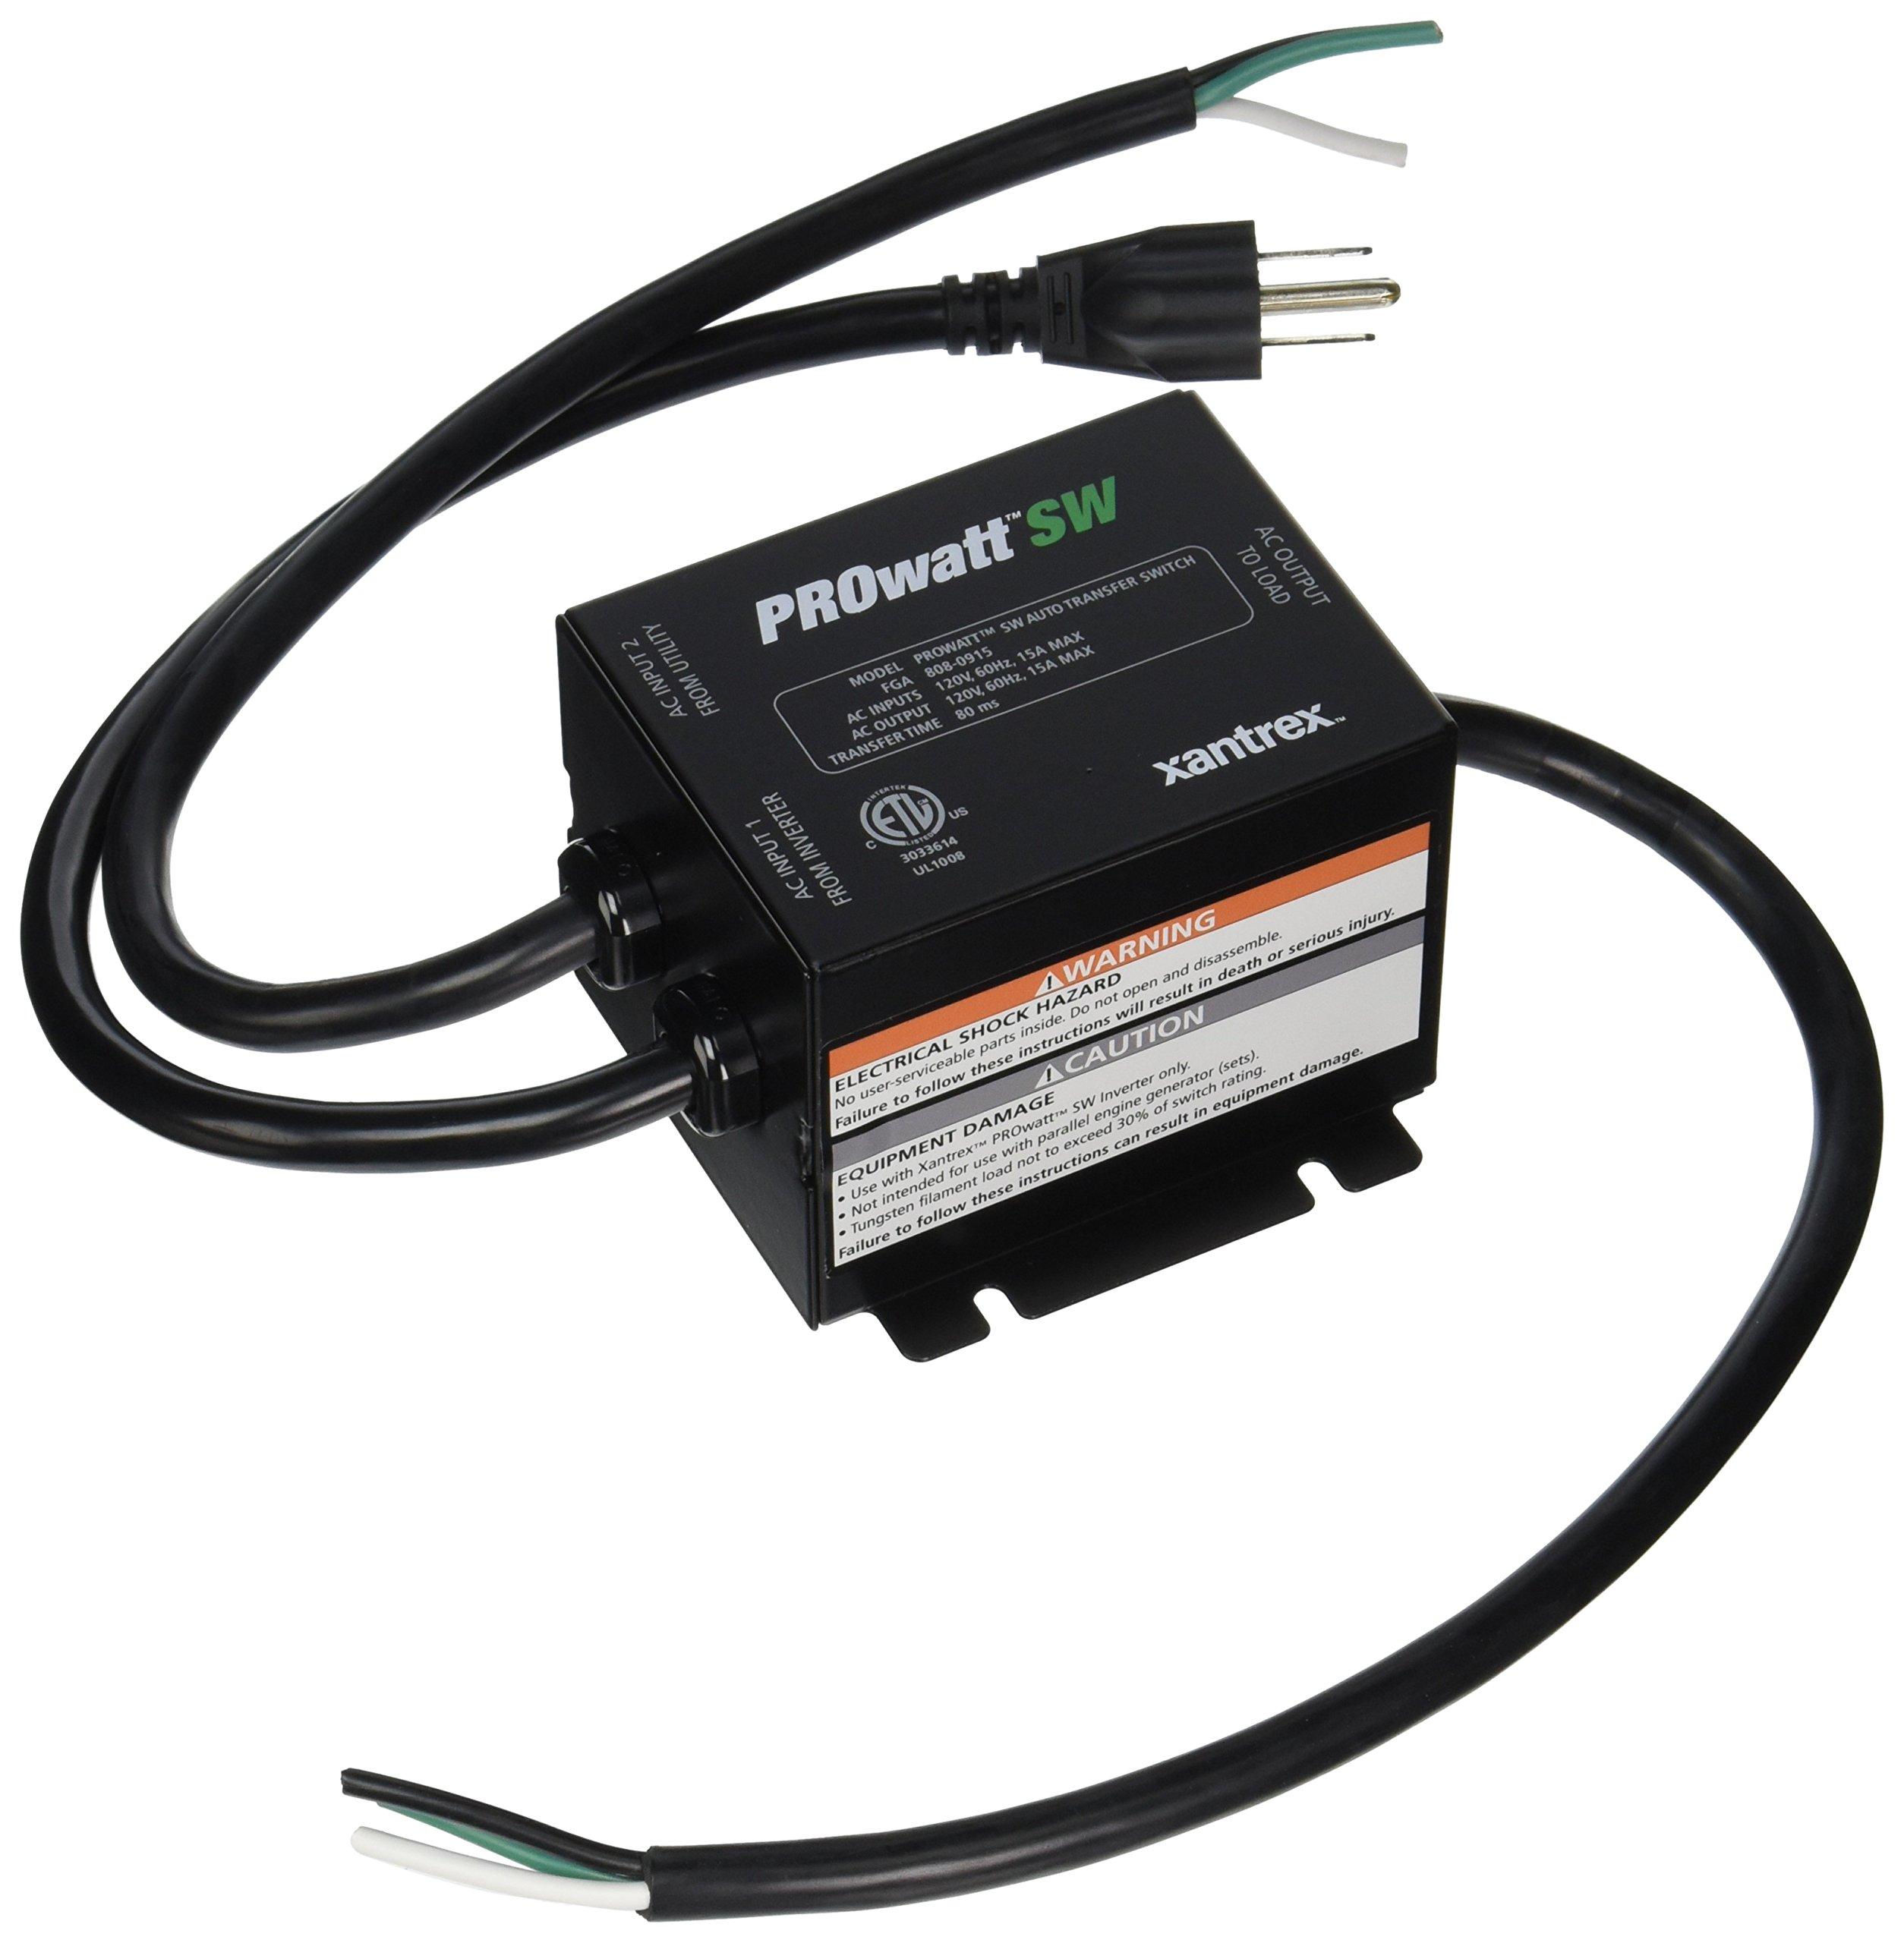 81WOLRa3fXL  Amp Automatic Transfer Switch Wiring Diagram on briggs stratton generator 01815, 200 amp manual generator, kohler 14resal no, manual portable generator, standby generator, rv generator,